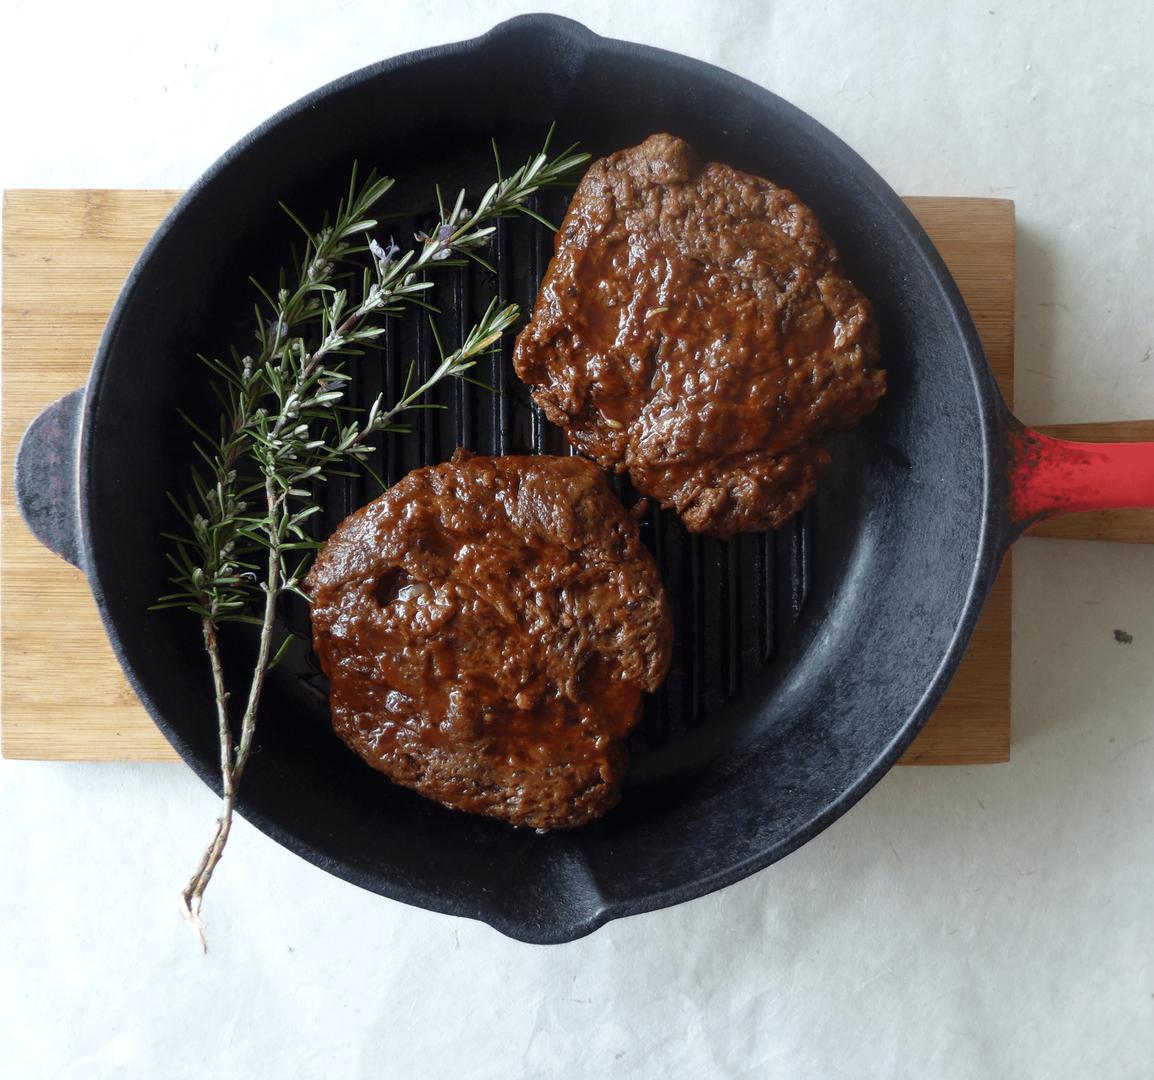 The No Meat Steak Company Chateau Steaks